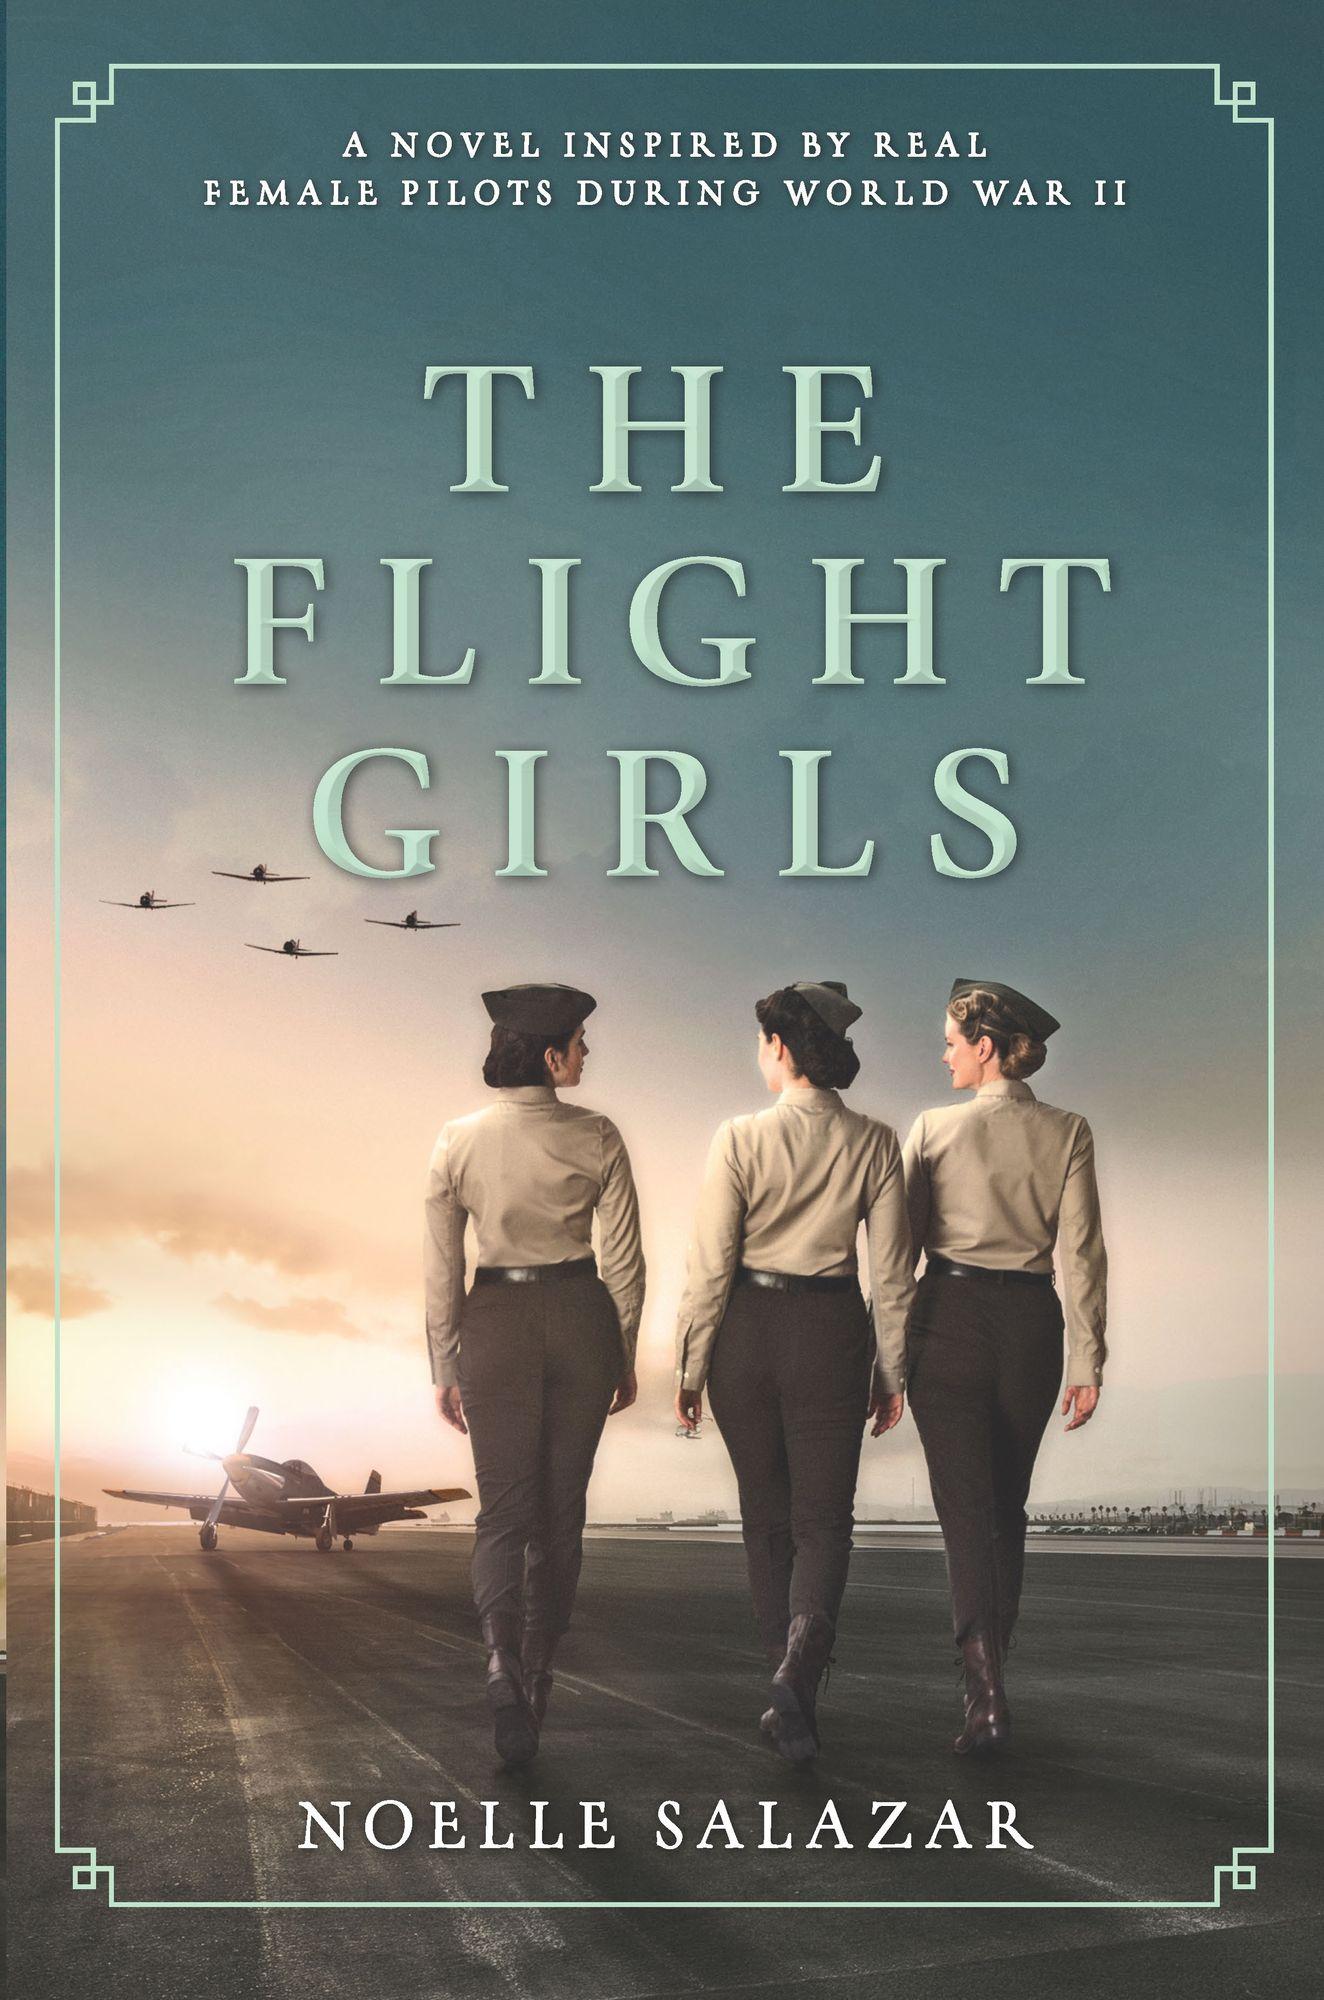 The Flight Girls by Noelle Salazar